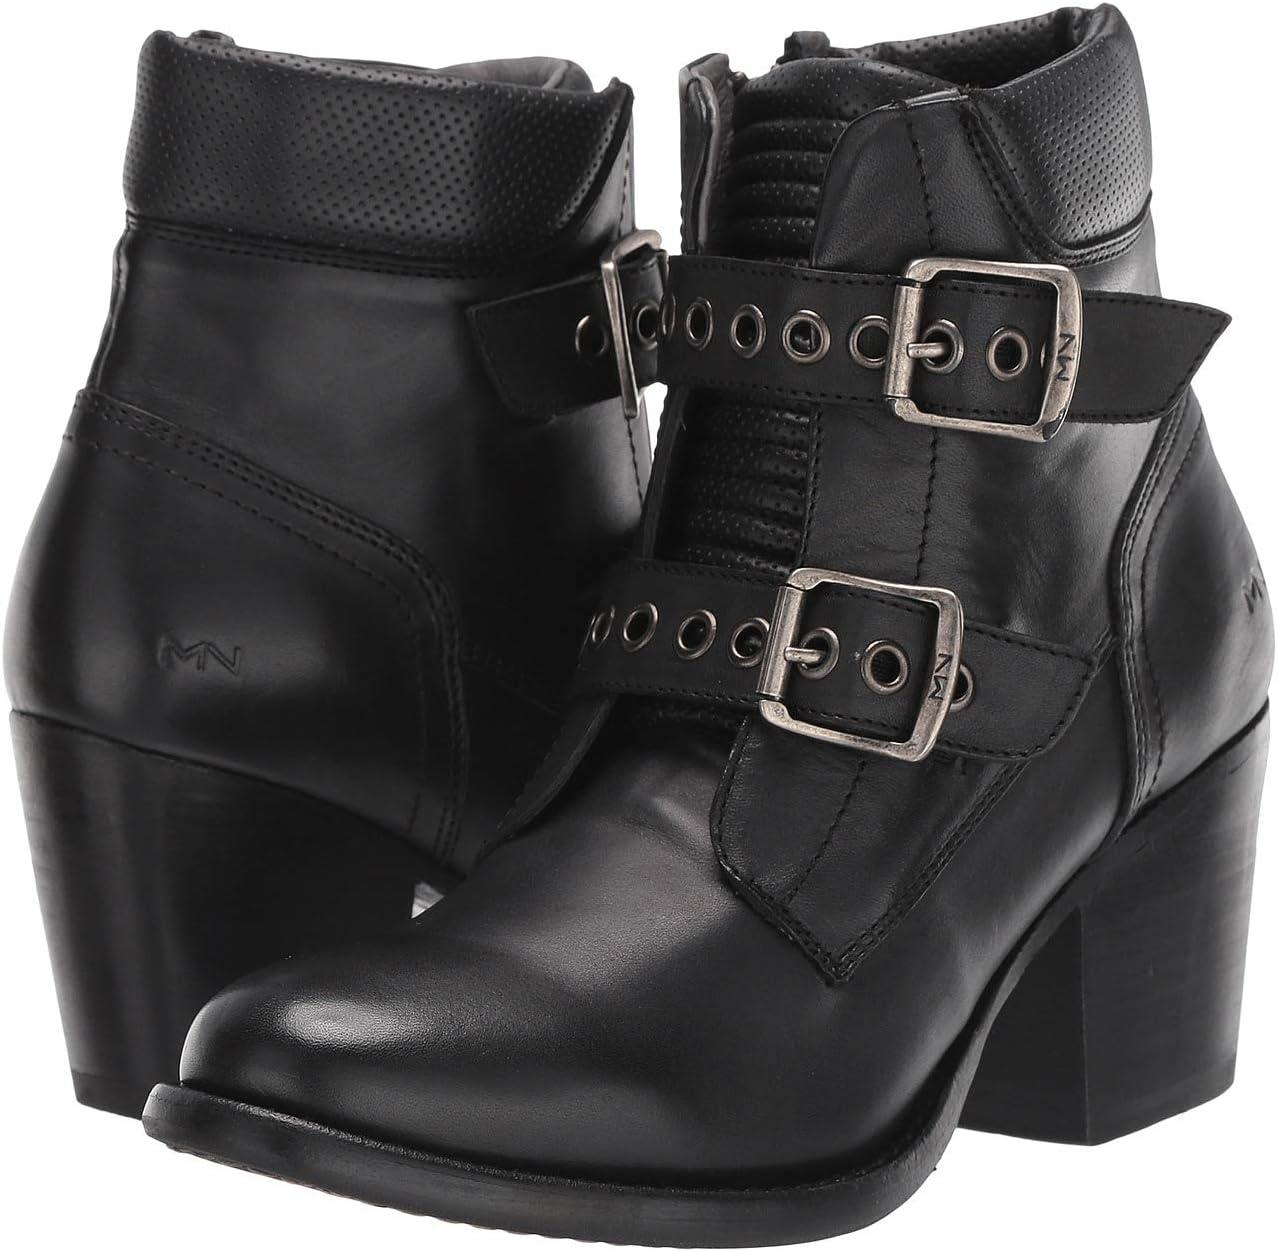 Mark Nason Women's Boots